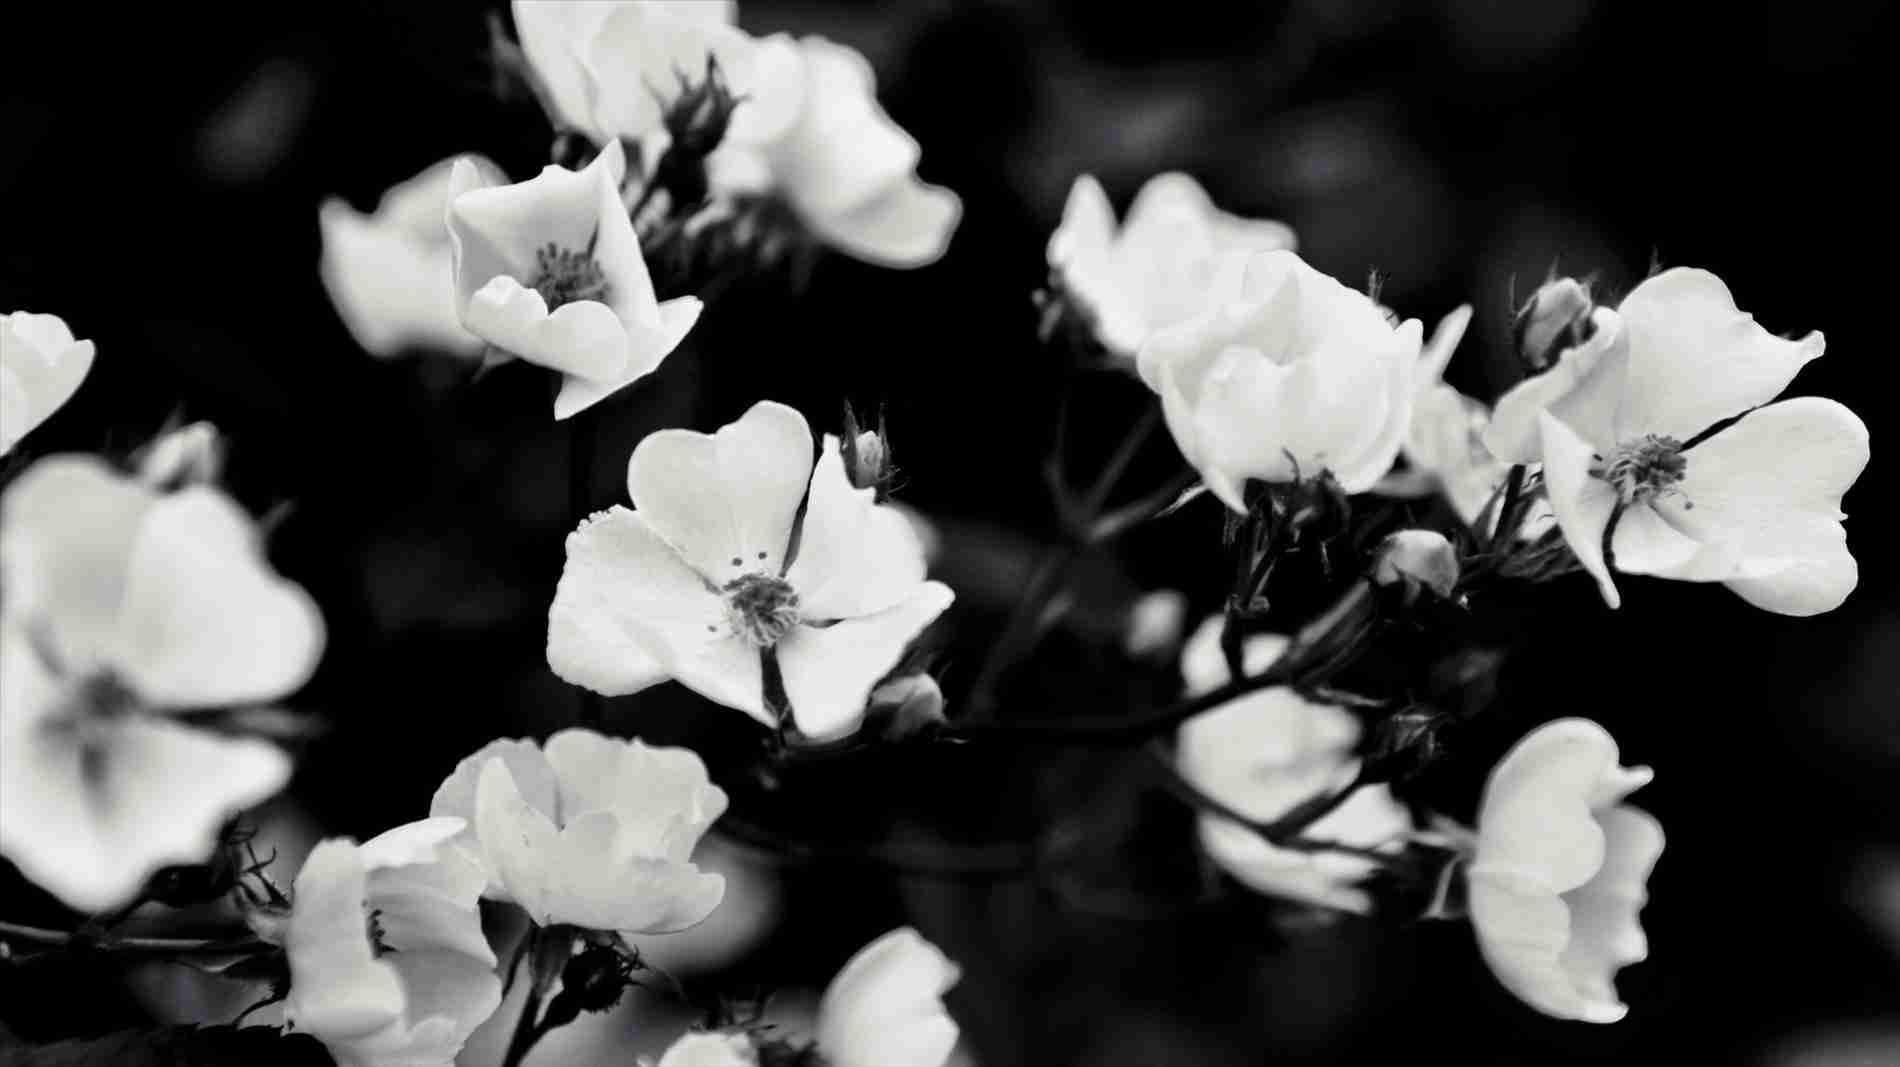 White Flower Laptop Wallpapers Top Free White Flower Laptop Backgrounds Wallpaperaccess